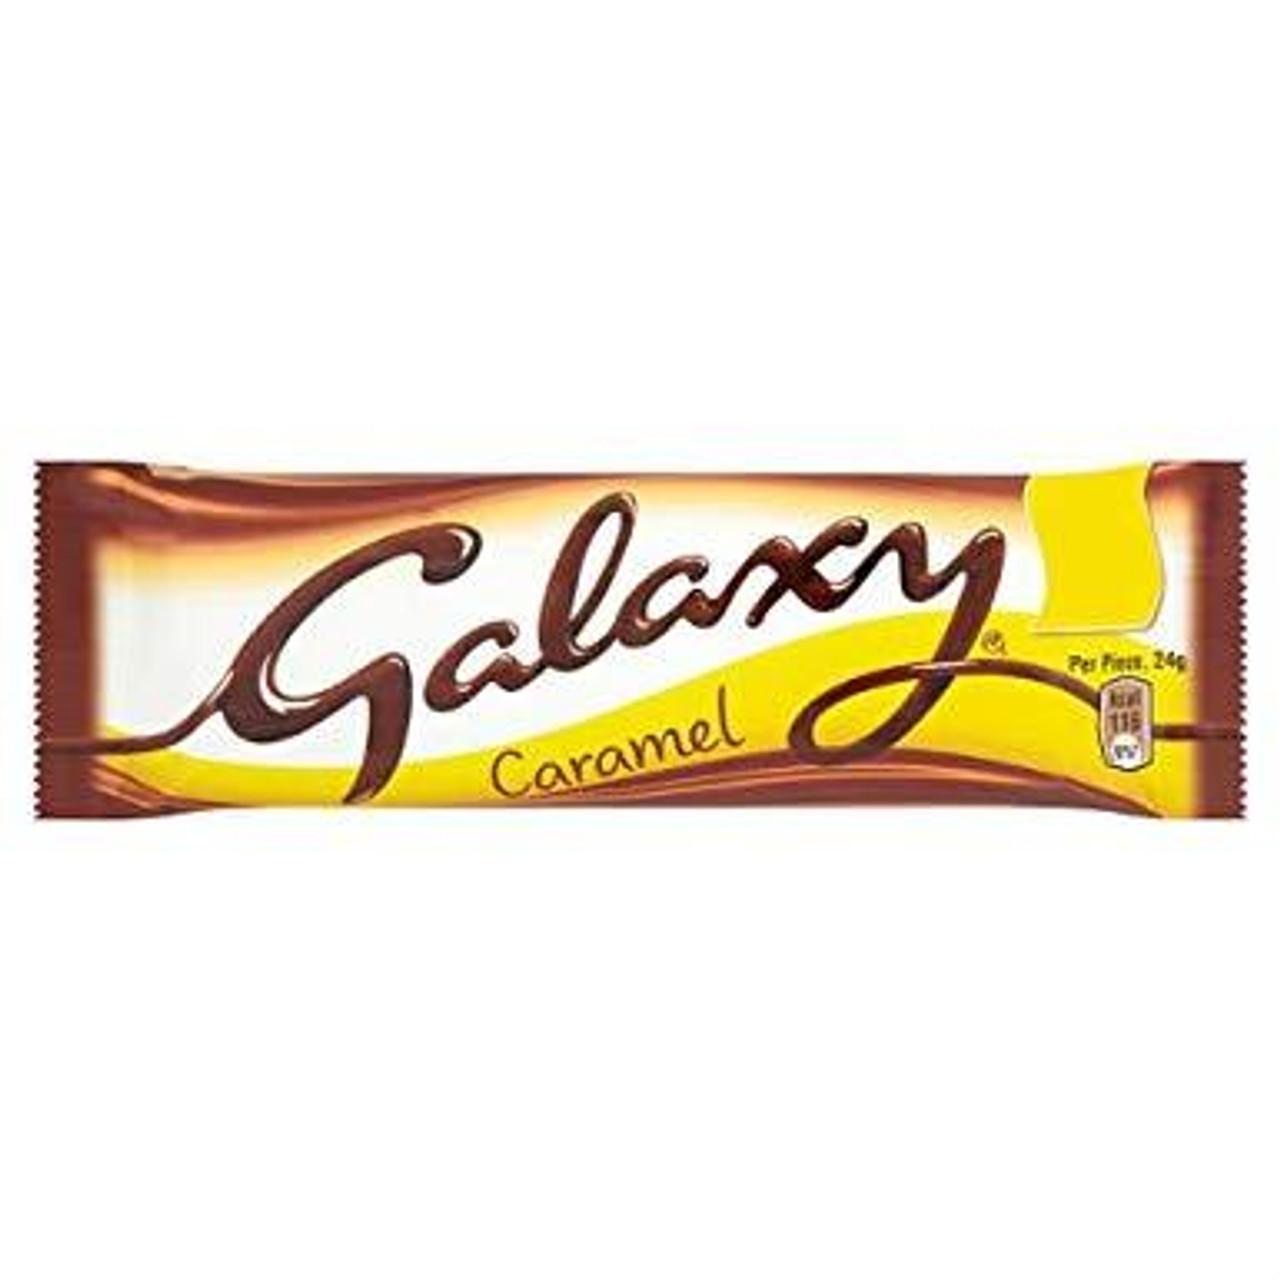 Mars - Galaxy Caramel, 42g